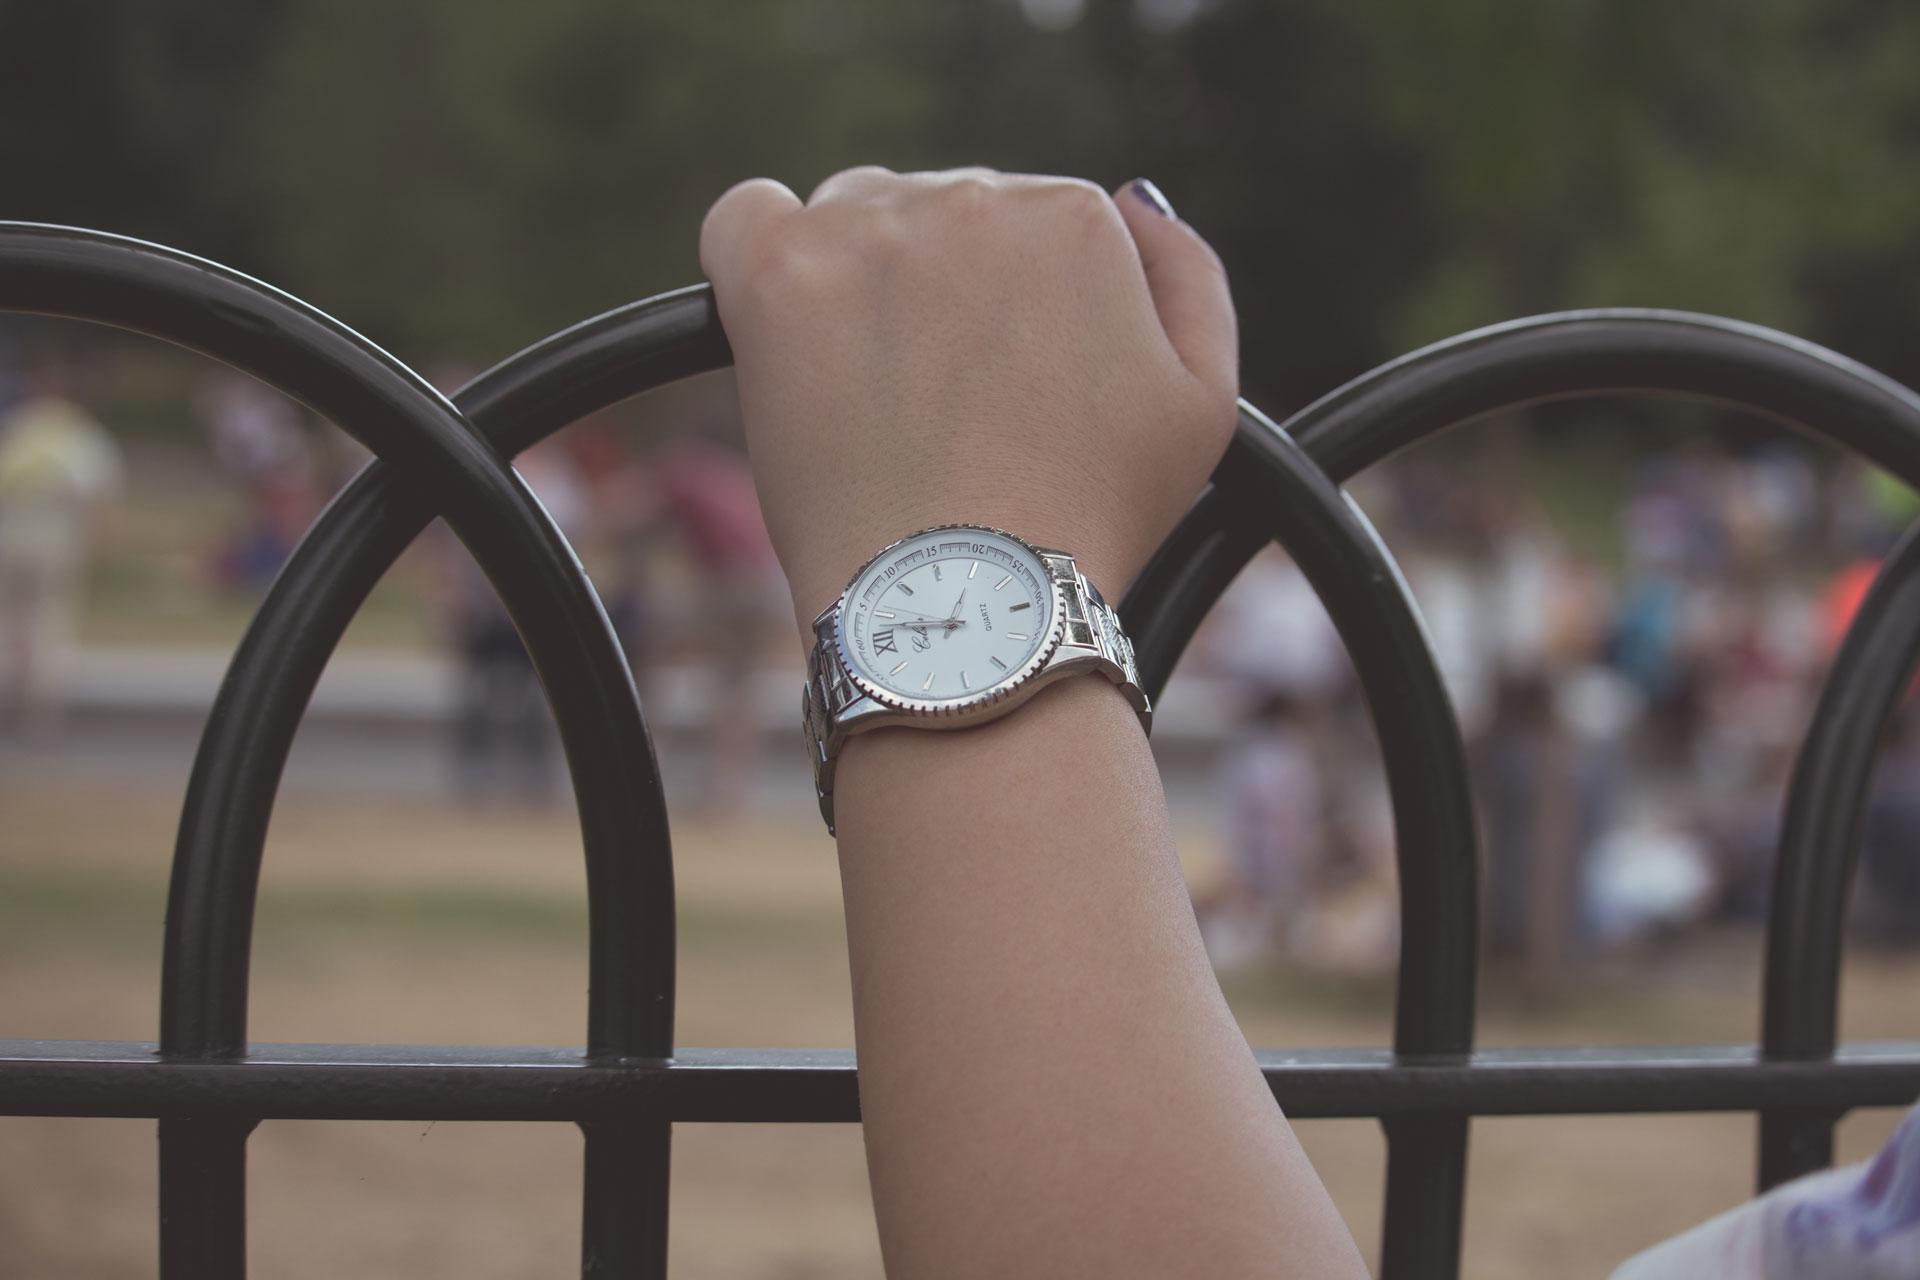 Armbanduhr am arm frau  Kostenloses Foto zum Thema: arm, armbanduhr, frau